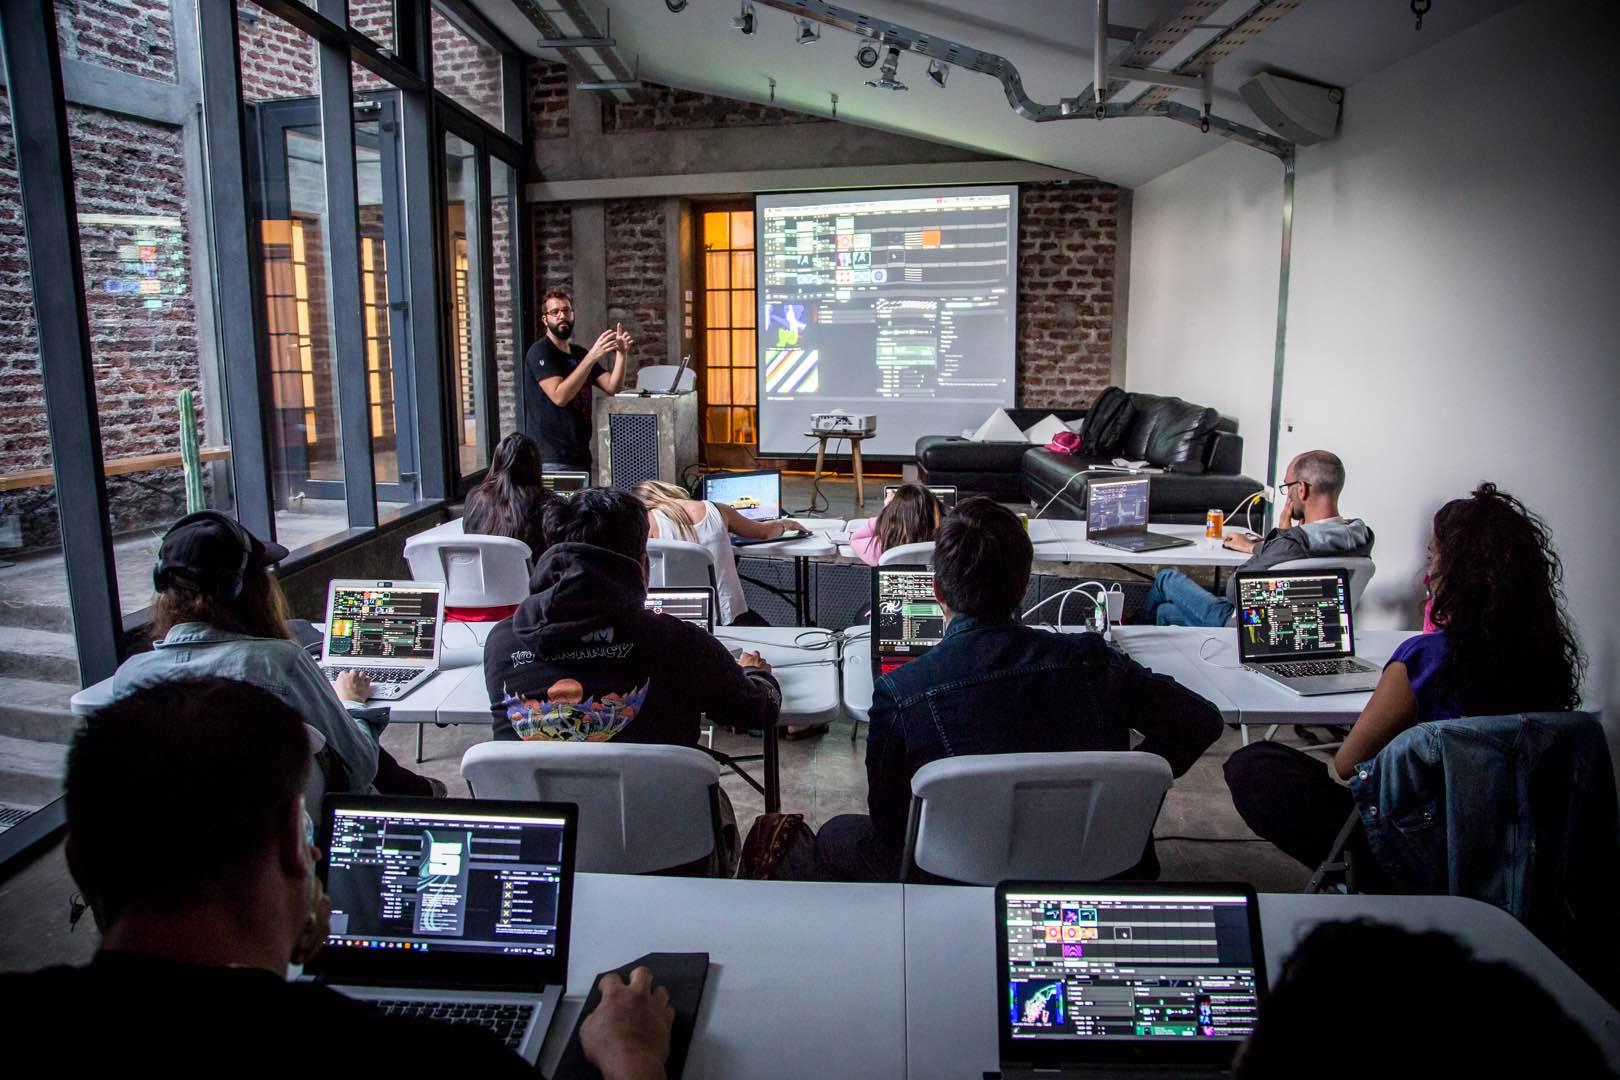 visuales nidra talleres y cursos visuales videomapping proyection